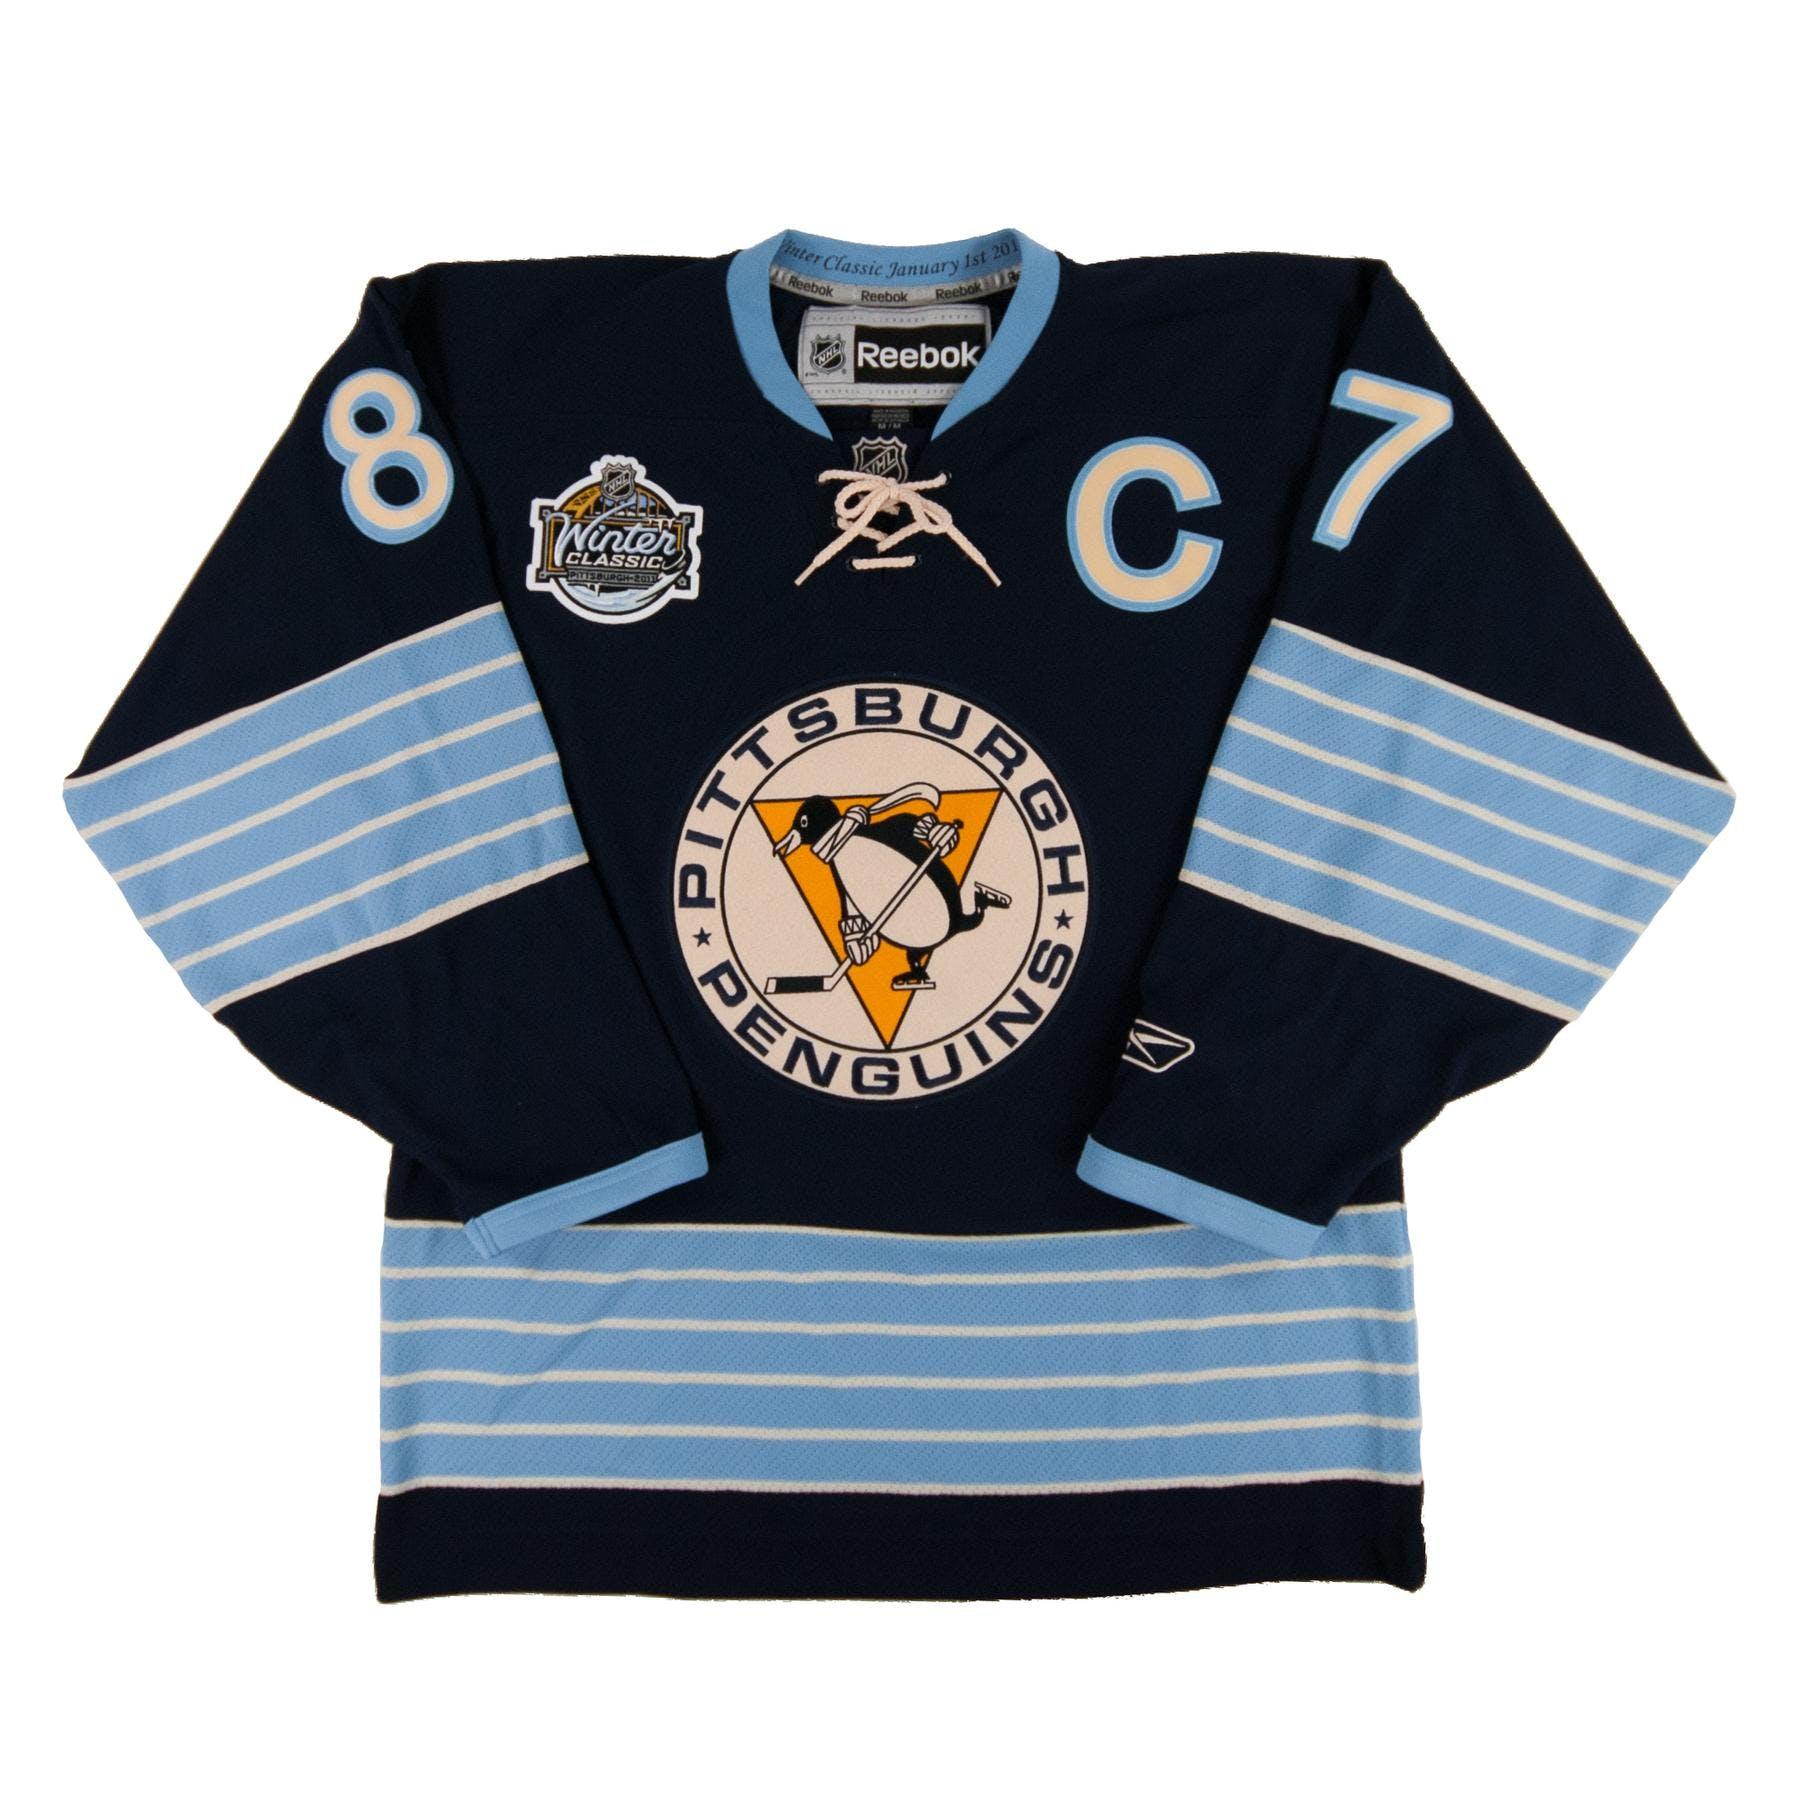 a5d1d0c80 Pittsburgh Penguins  87 Sidney Crosby Reebok Navy Winter Classic 2011  Premier Jersey